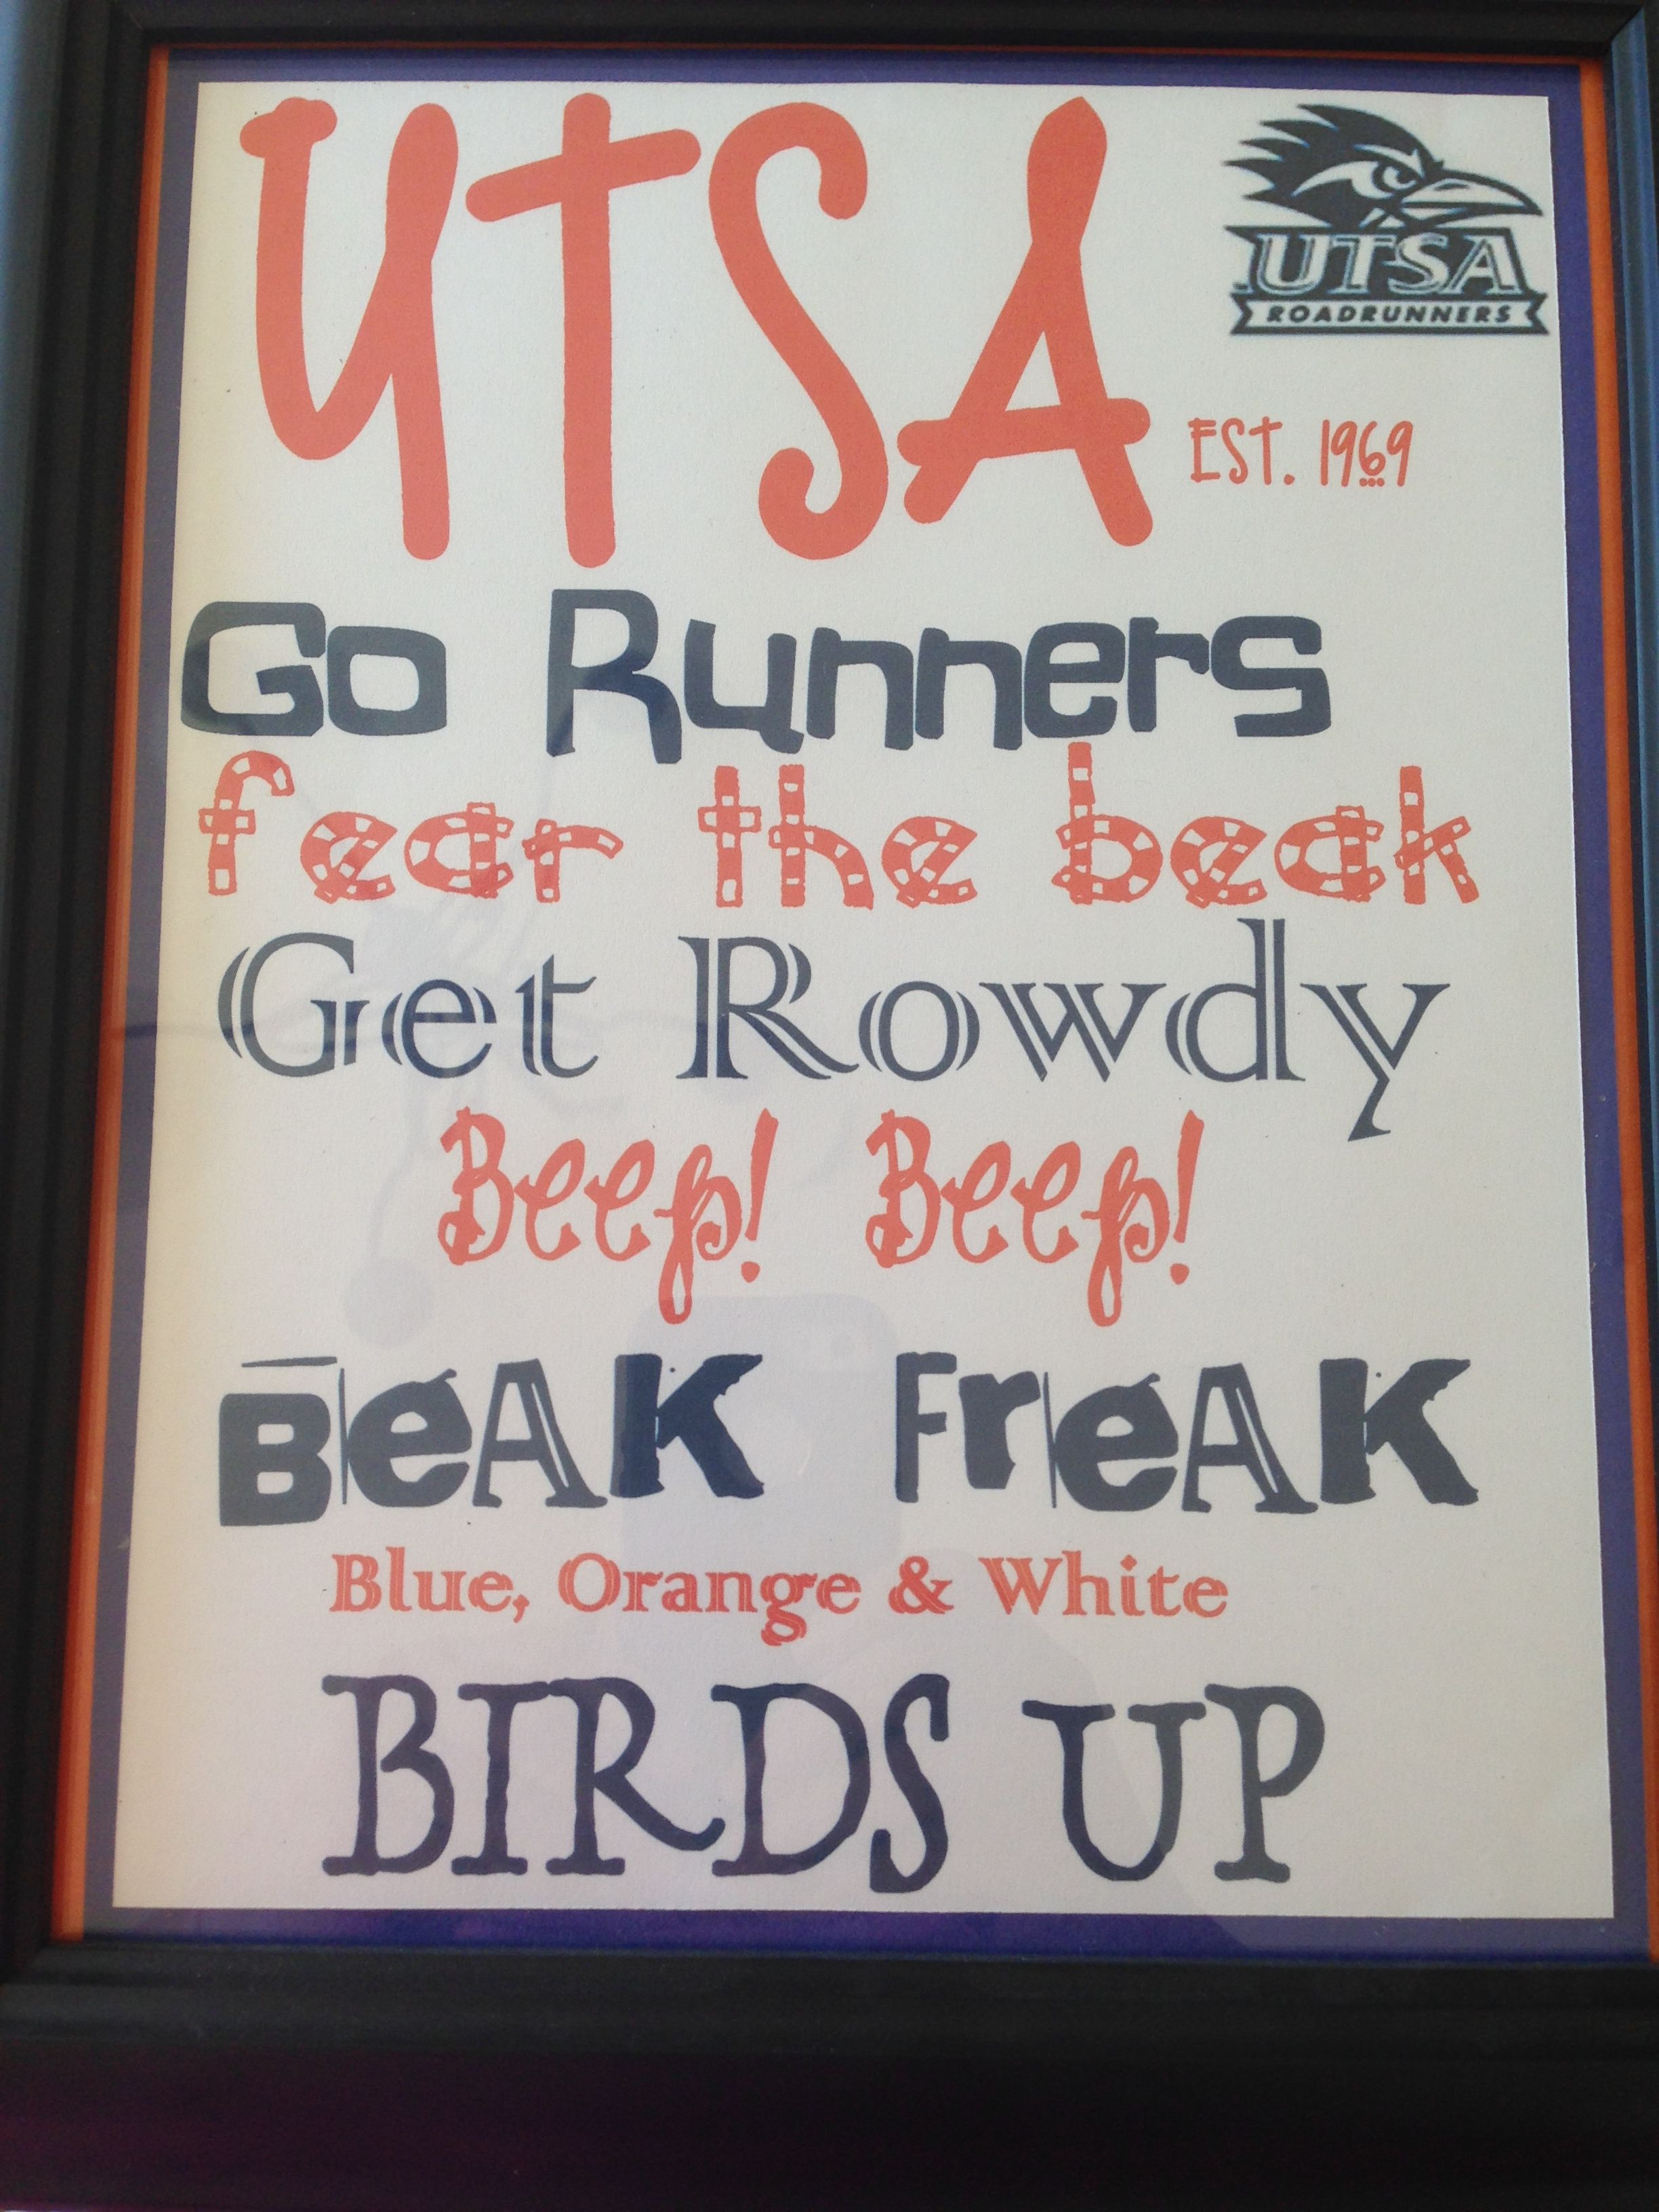 Personalized Custom UTSA Birds Up Texas Decal University Of Texas - Custom car decals san antonio   how to personalize